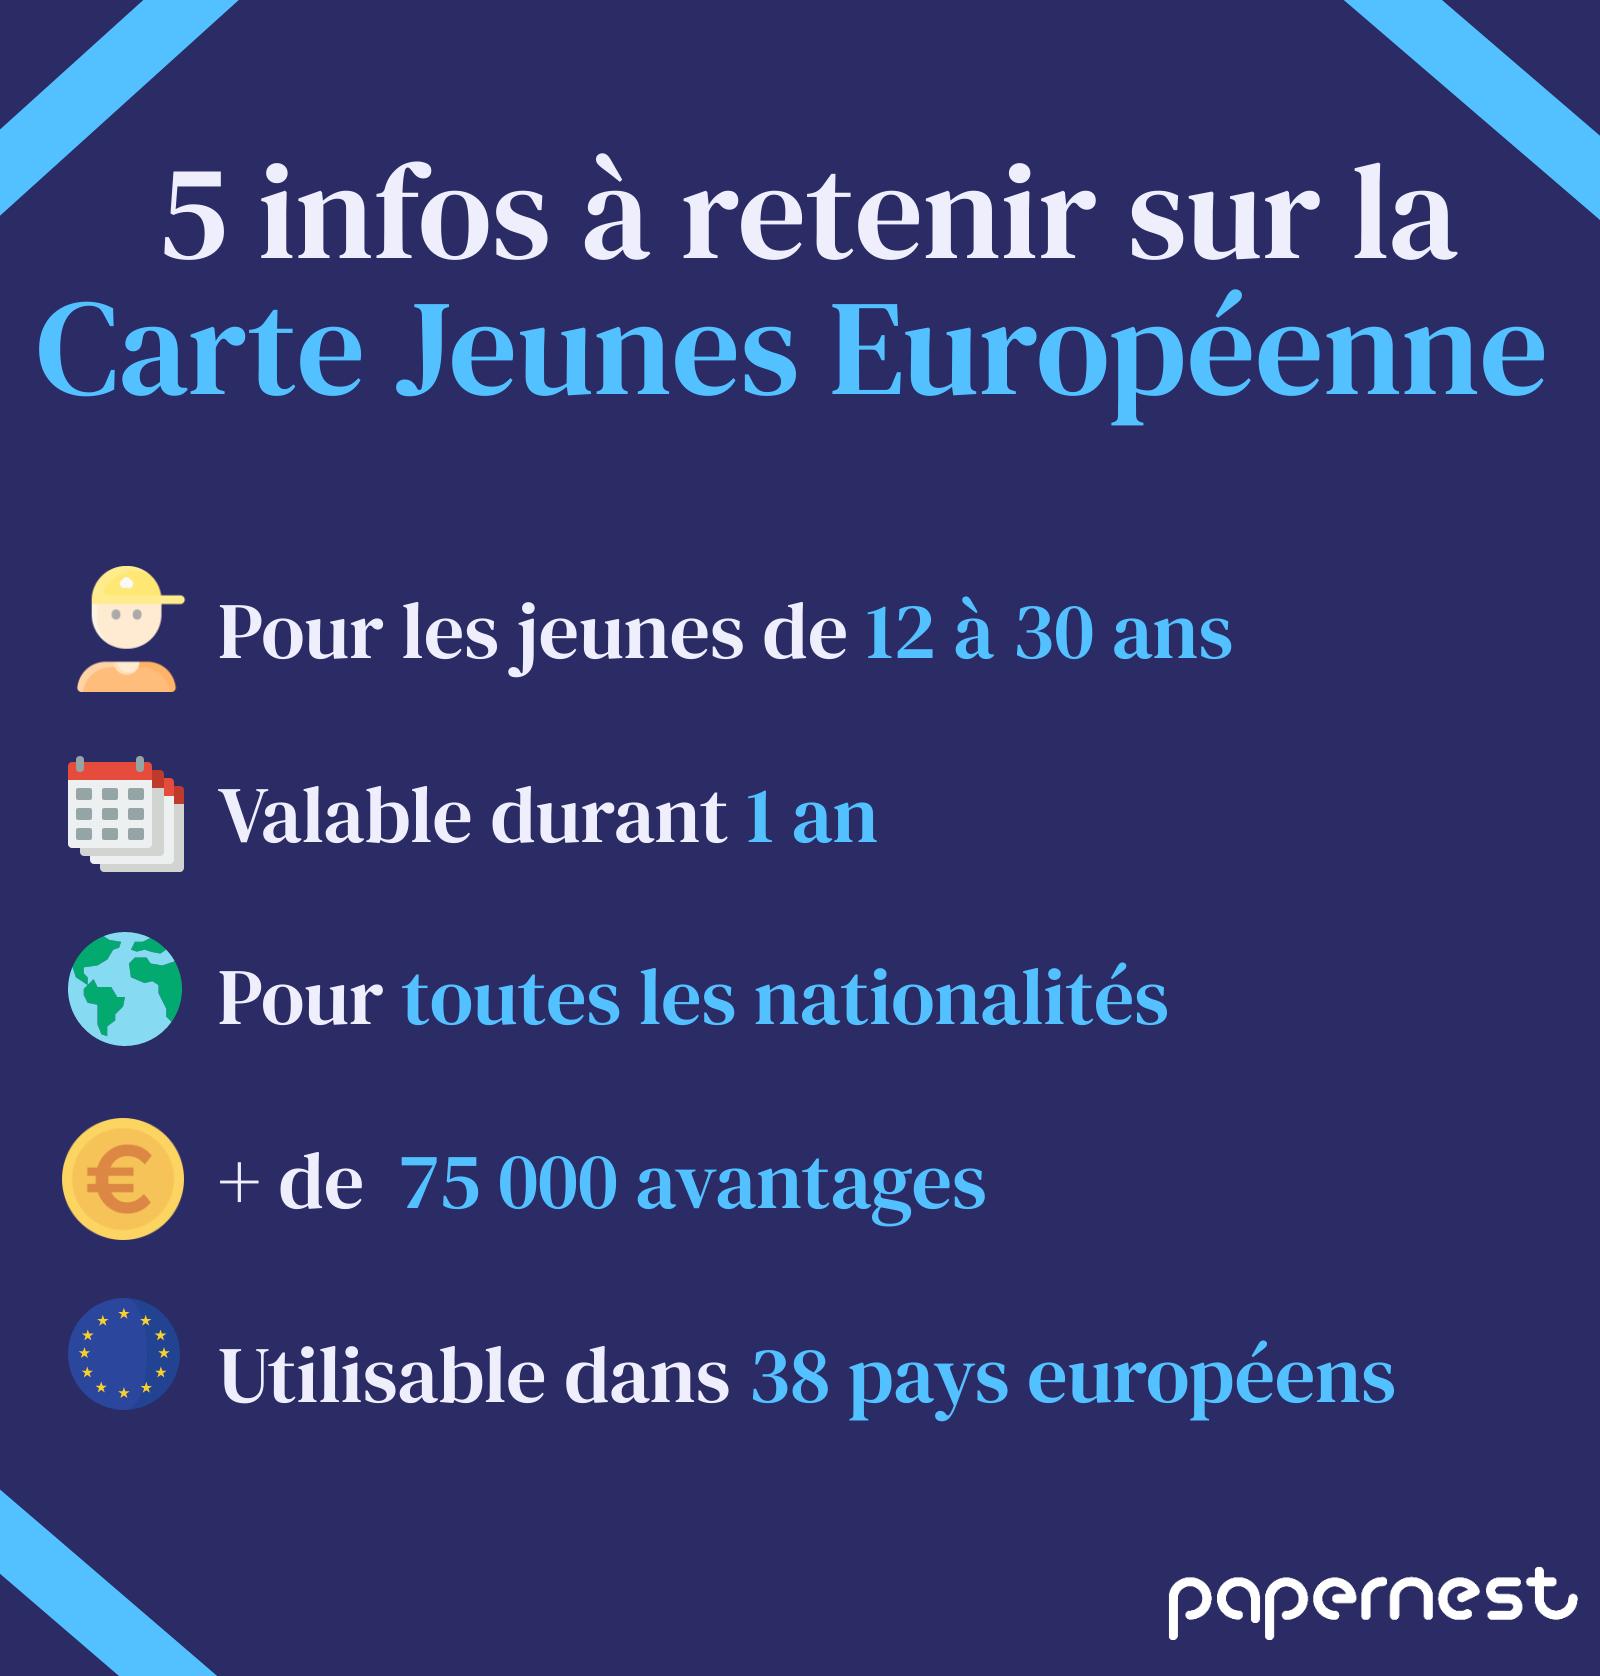 carte jeunes européenne infographie